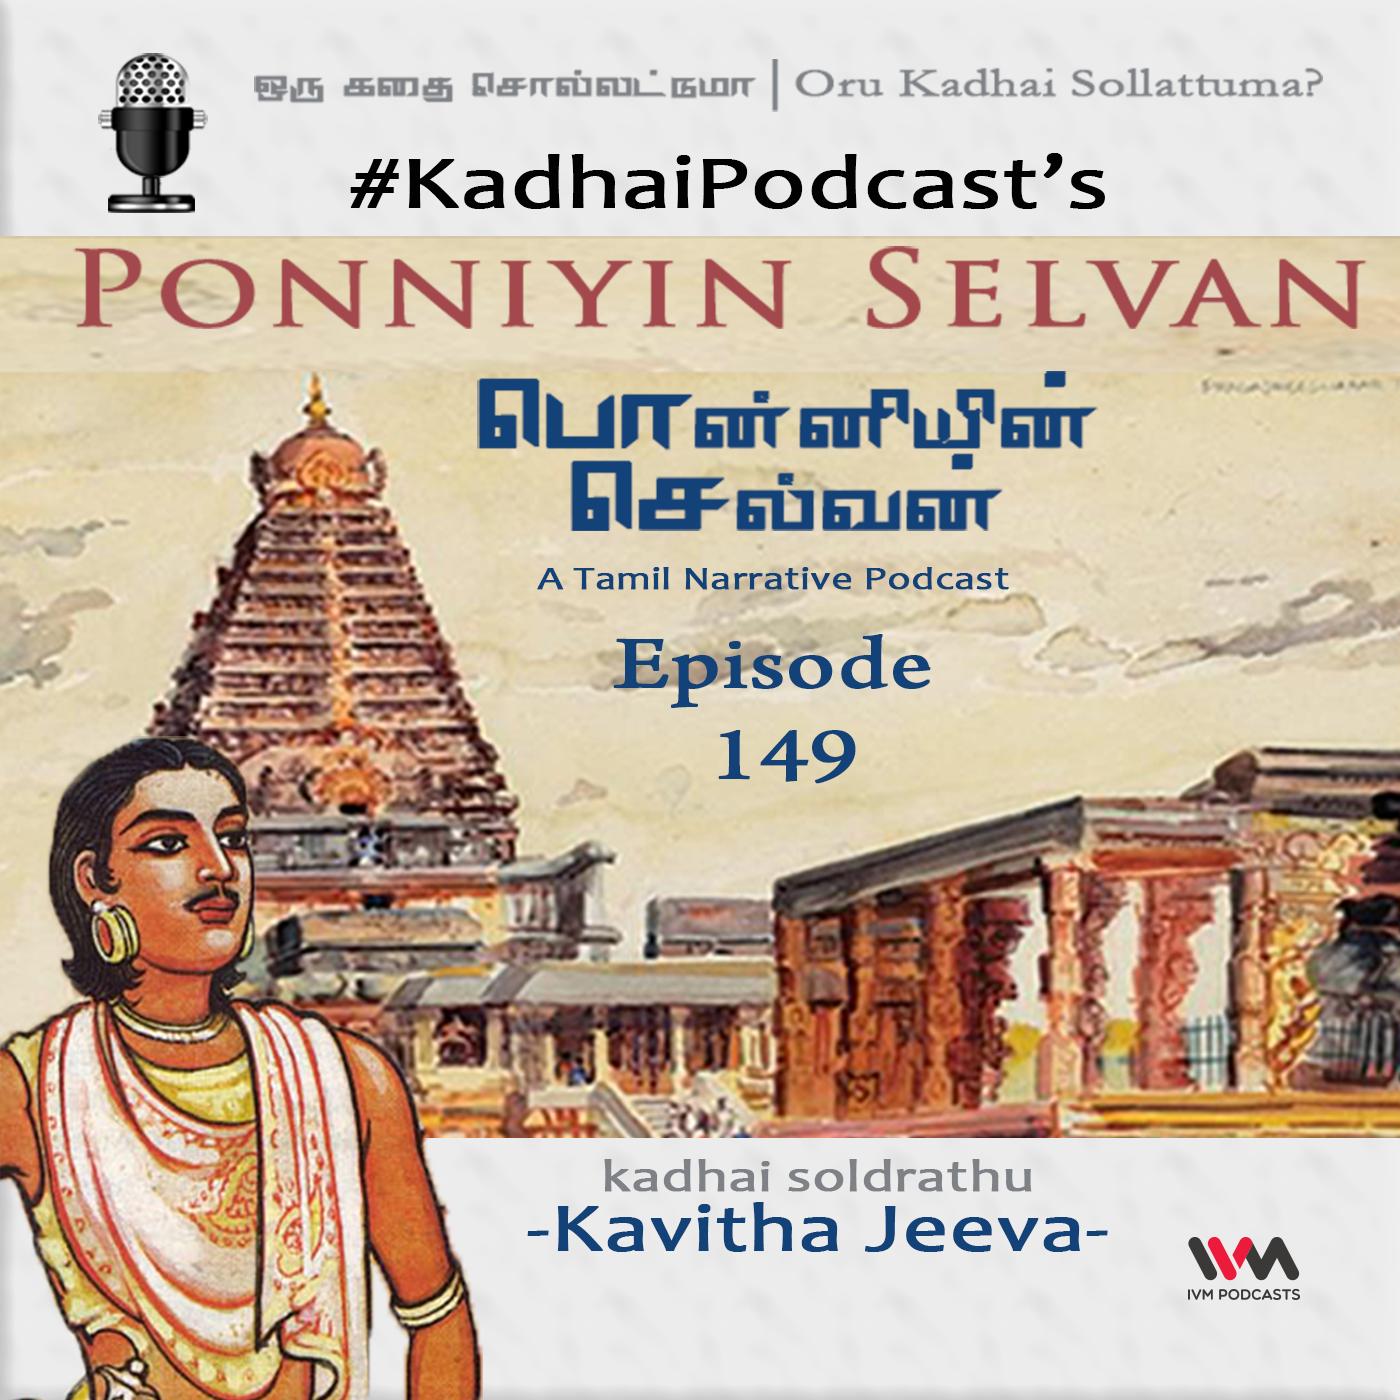 KadhaiPodcast's Ponniyin Selvan - Episode # 149